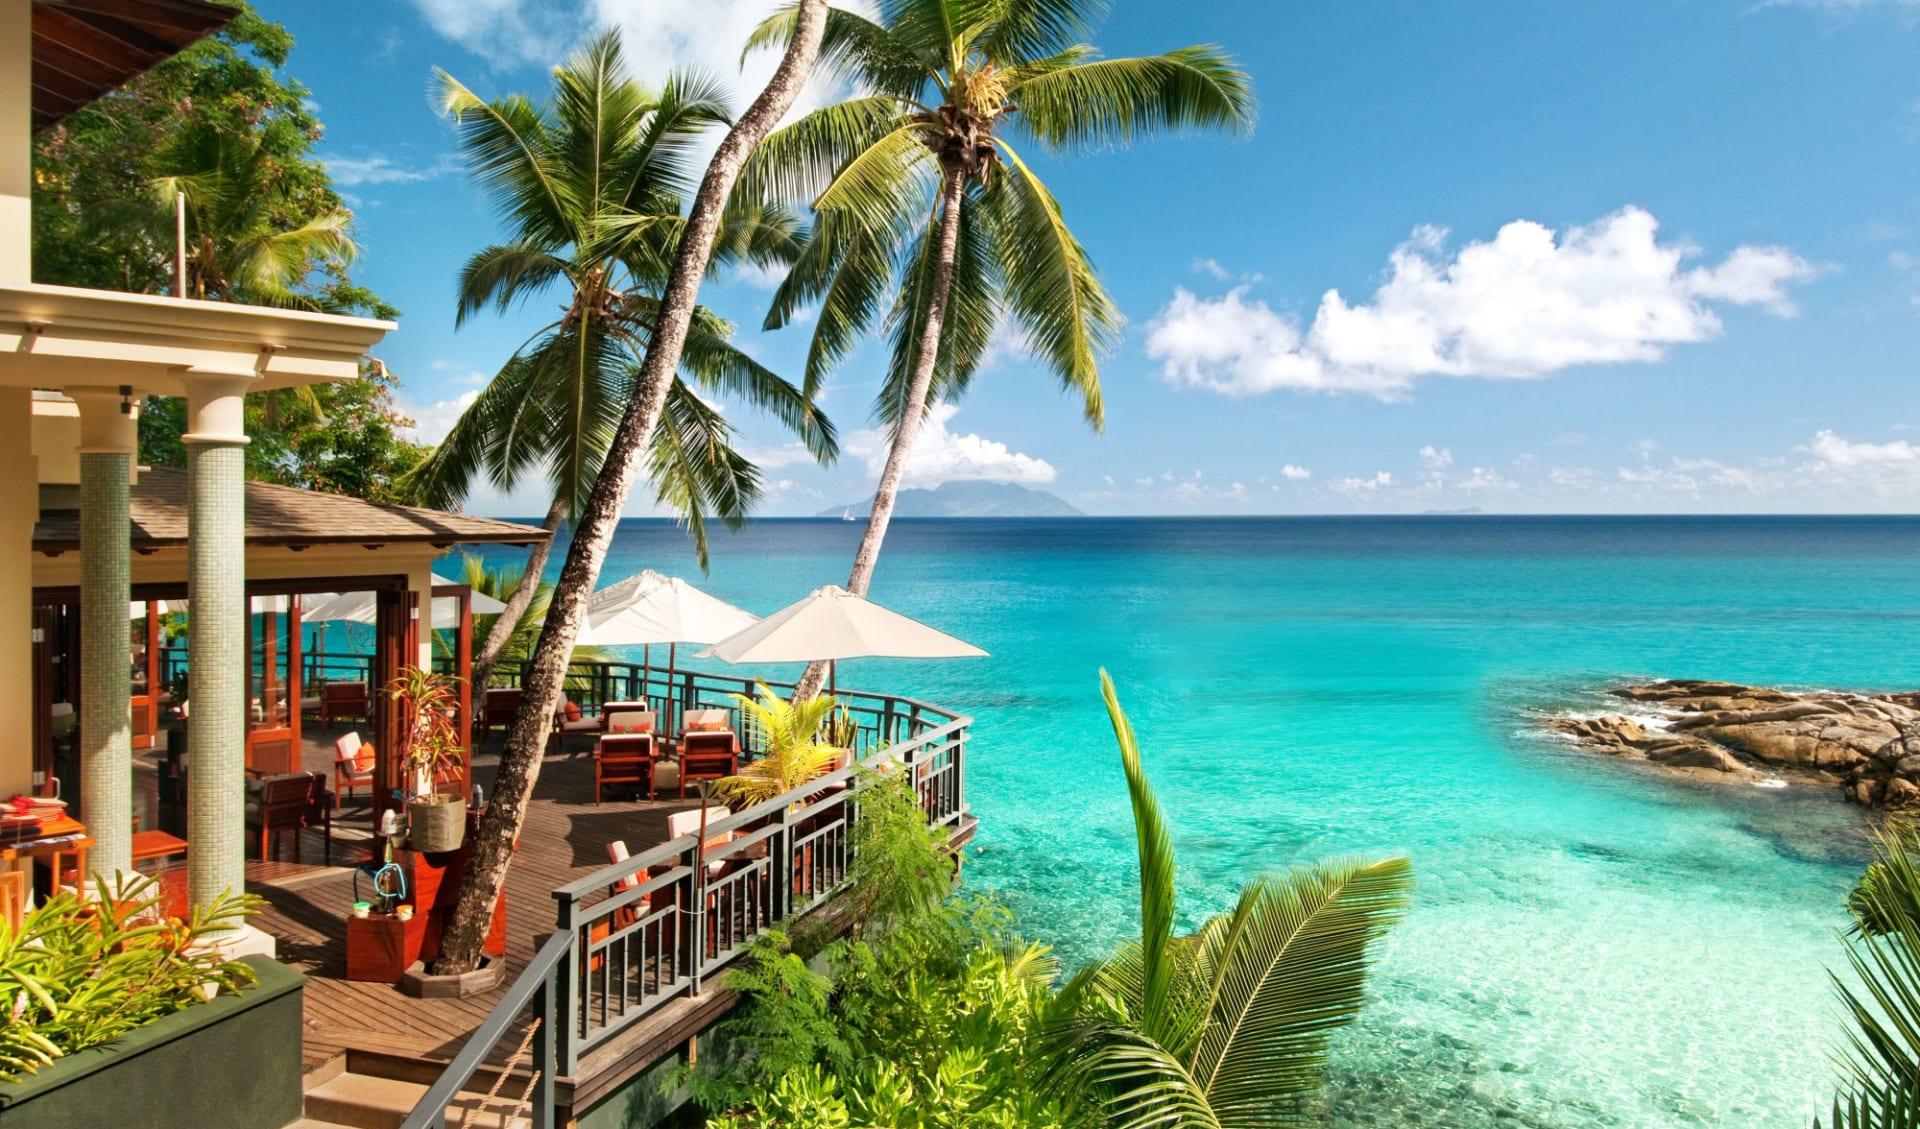 Hilton Seychelles Northolme Resort & Spa in Mahé: